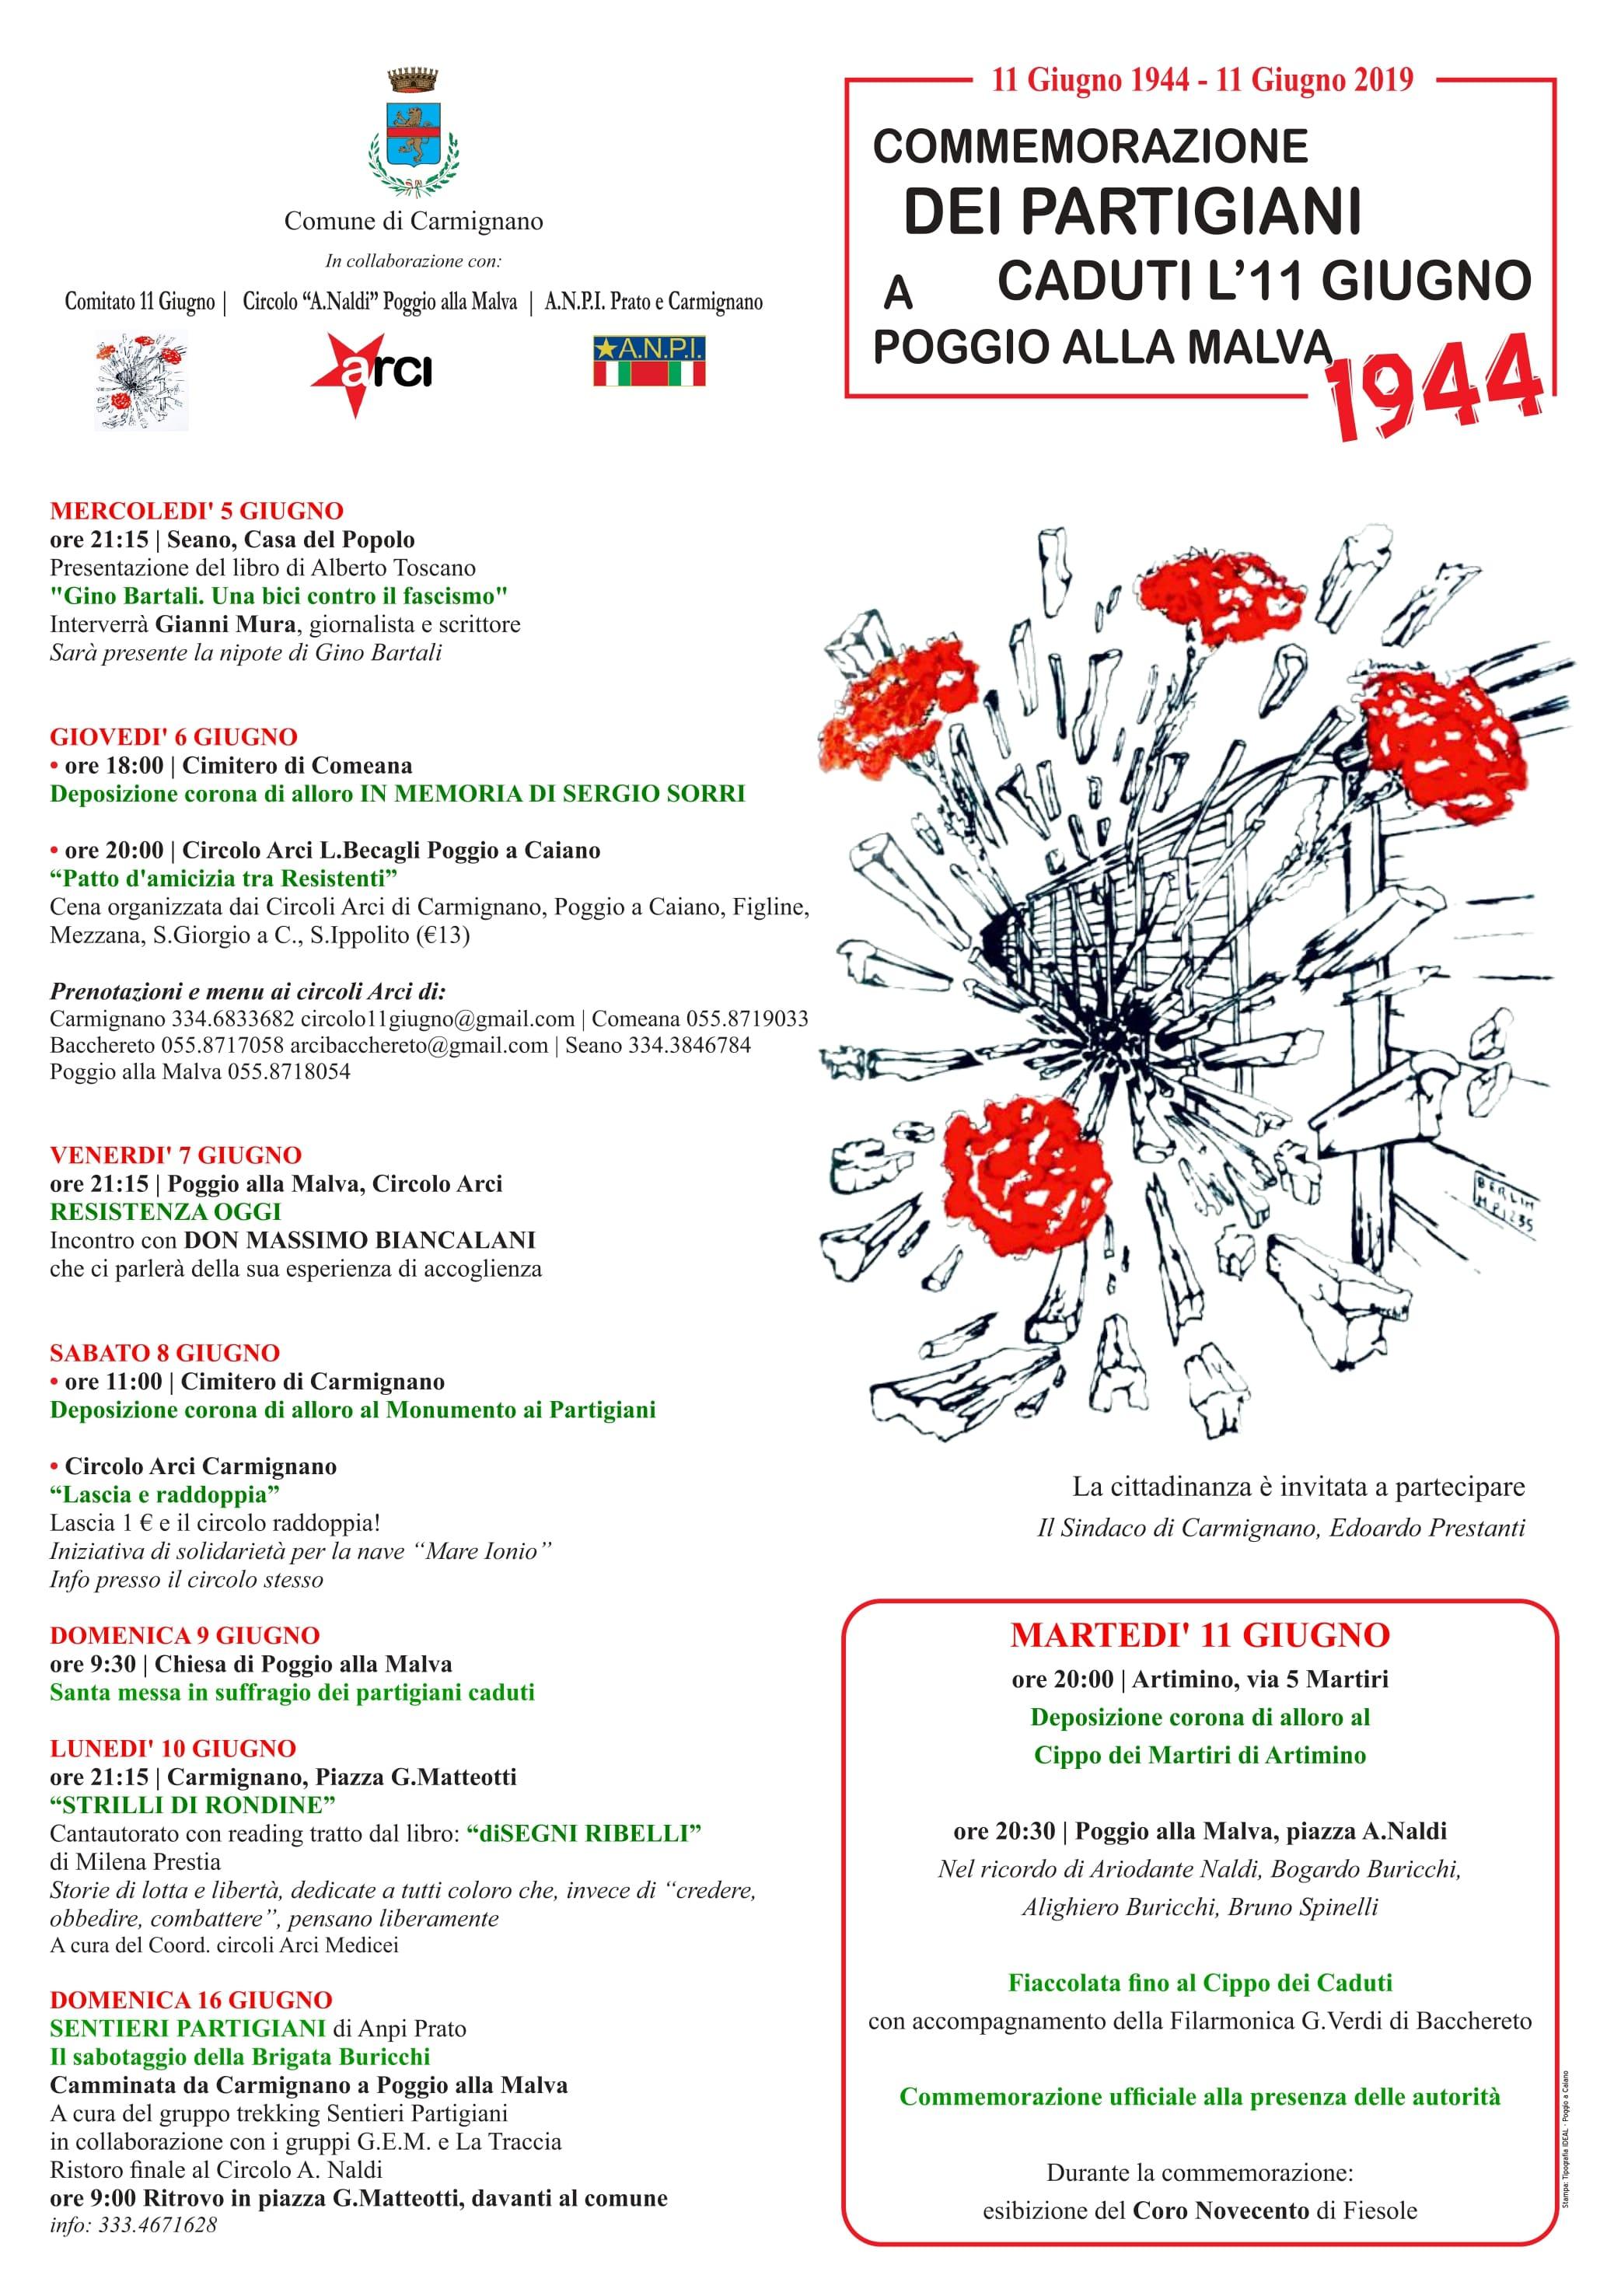 11 GIUGNO 2019 LOCANDINA_page-0001 (1)